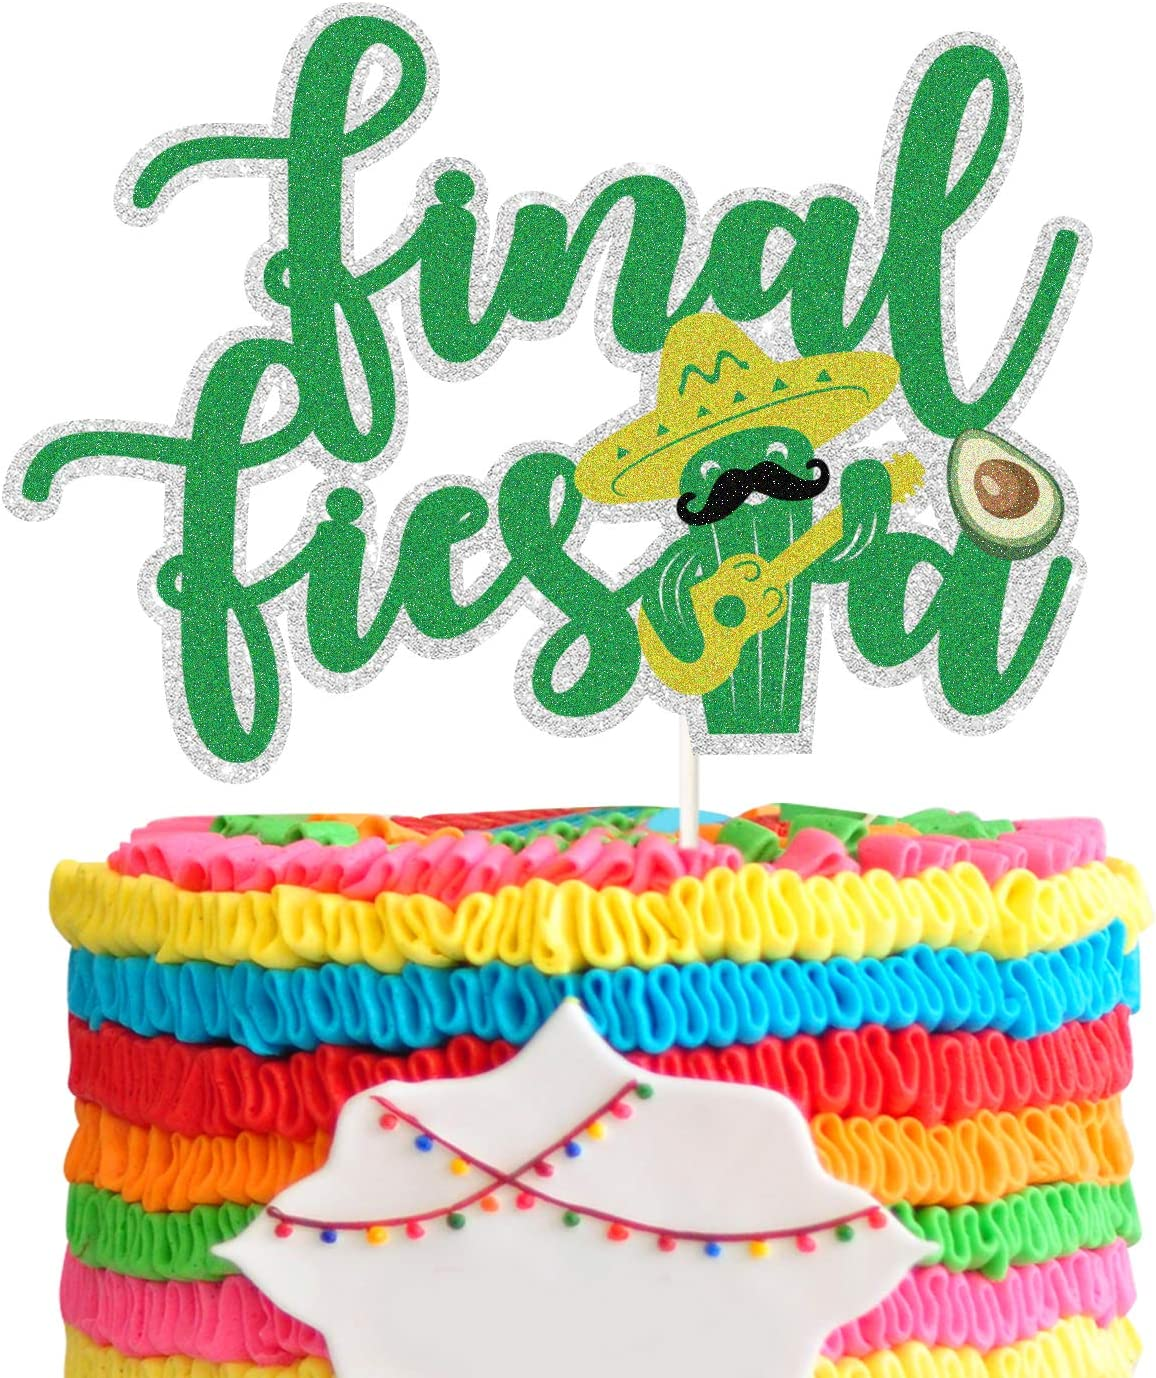 Final Fiesta Cake Topper , Green Double Side Glitter Cactus Cake Decor, Final Fiesta Future Mrs Bachelorette Party Cake Decoration,Bachelorette Party Supplies.